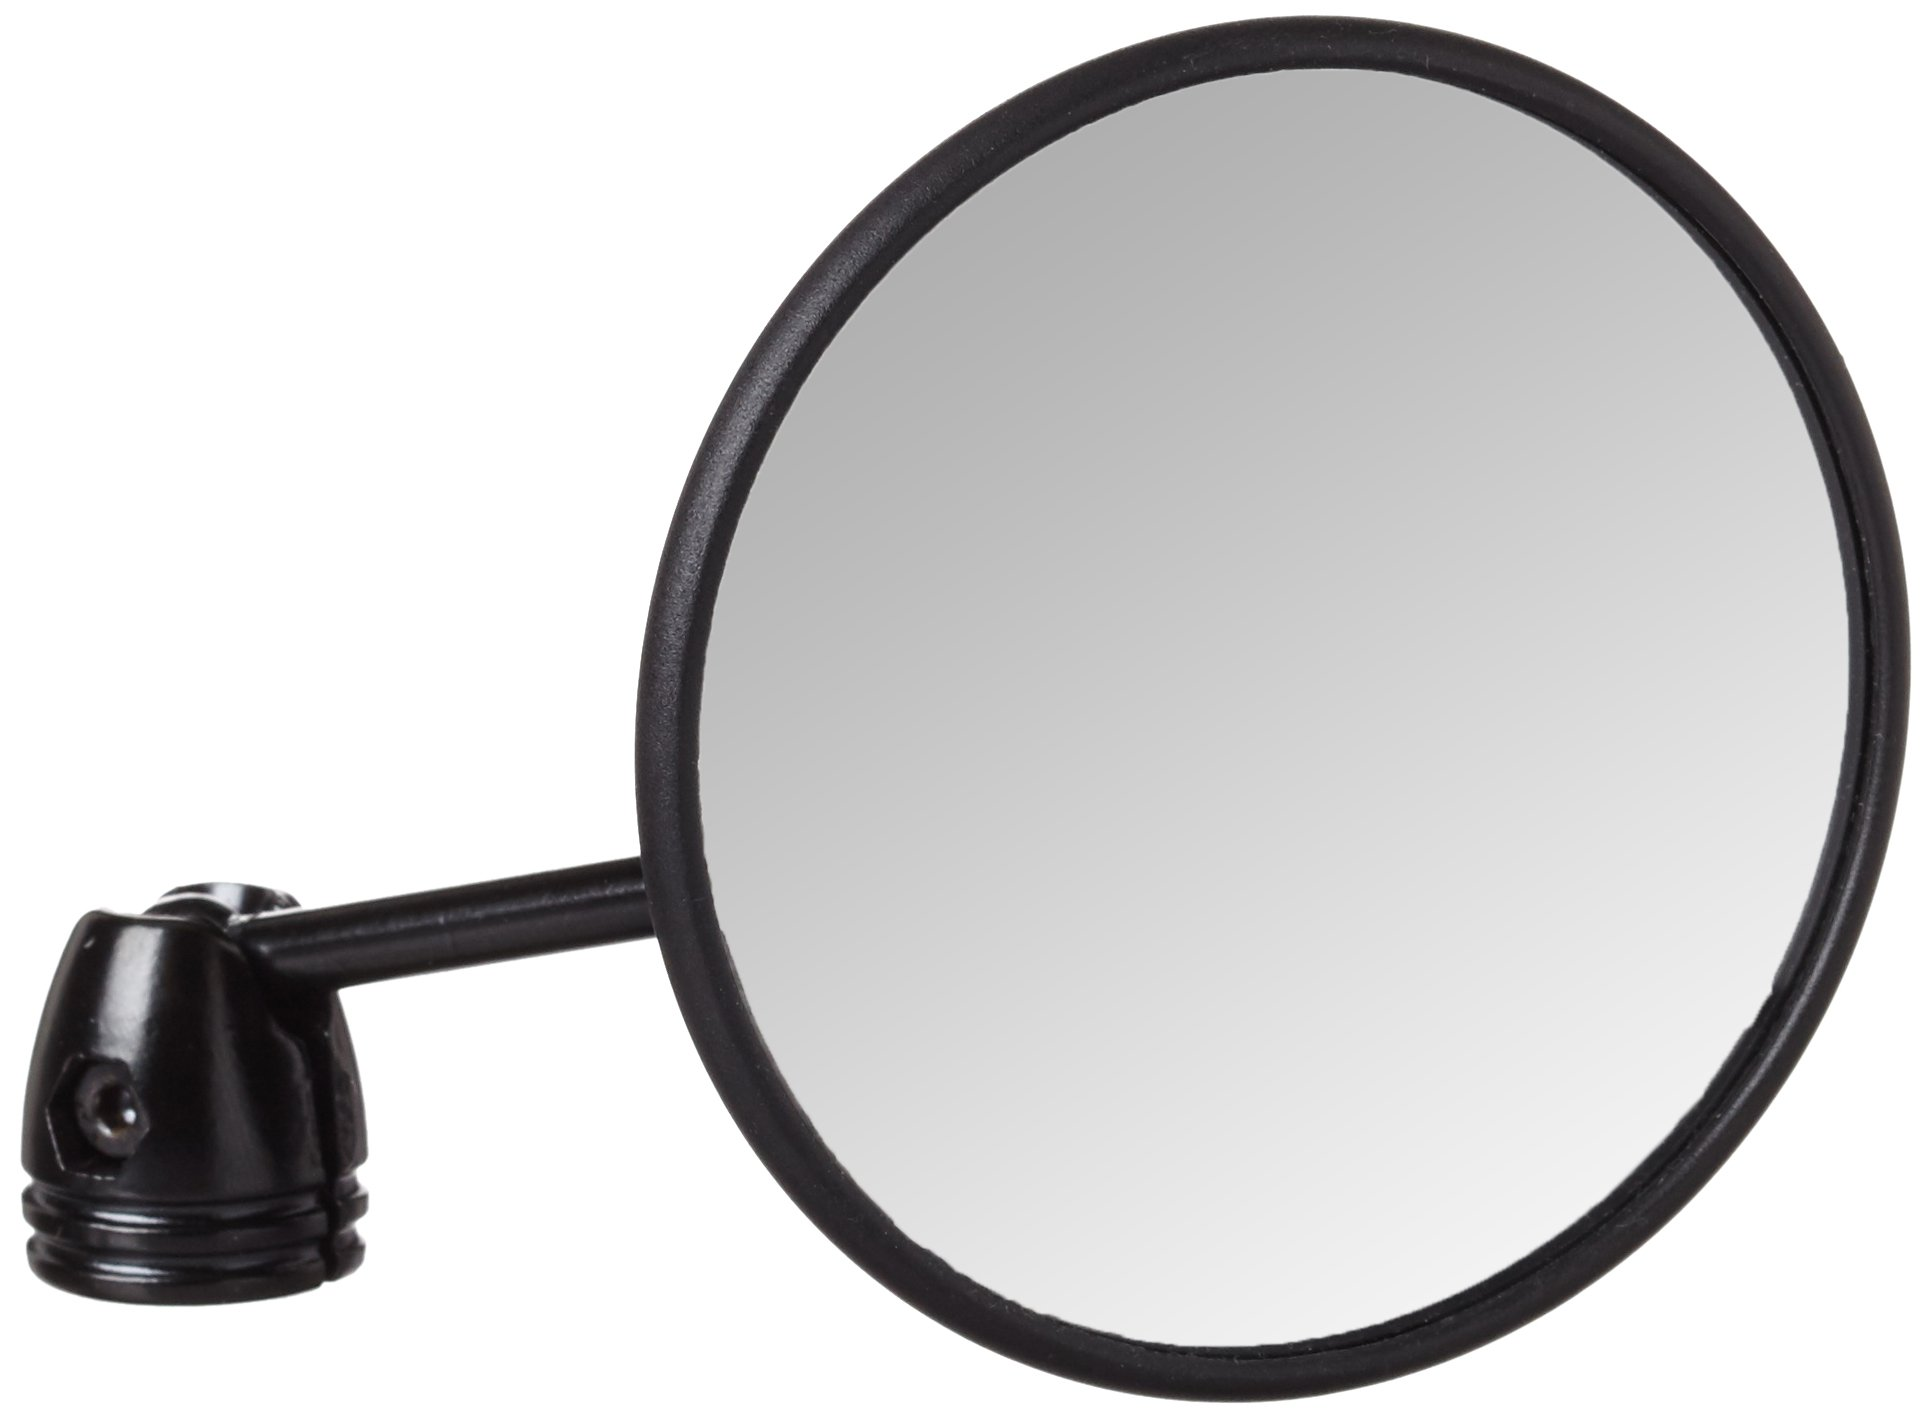 BUSCH + MÜLLER Cycle Star Mirror 903/1